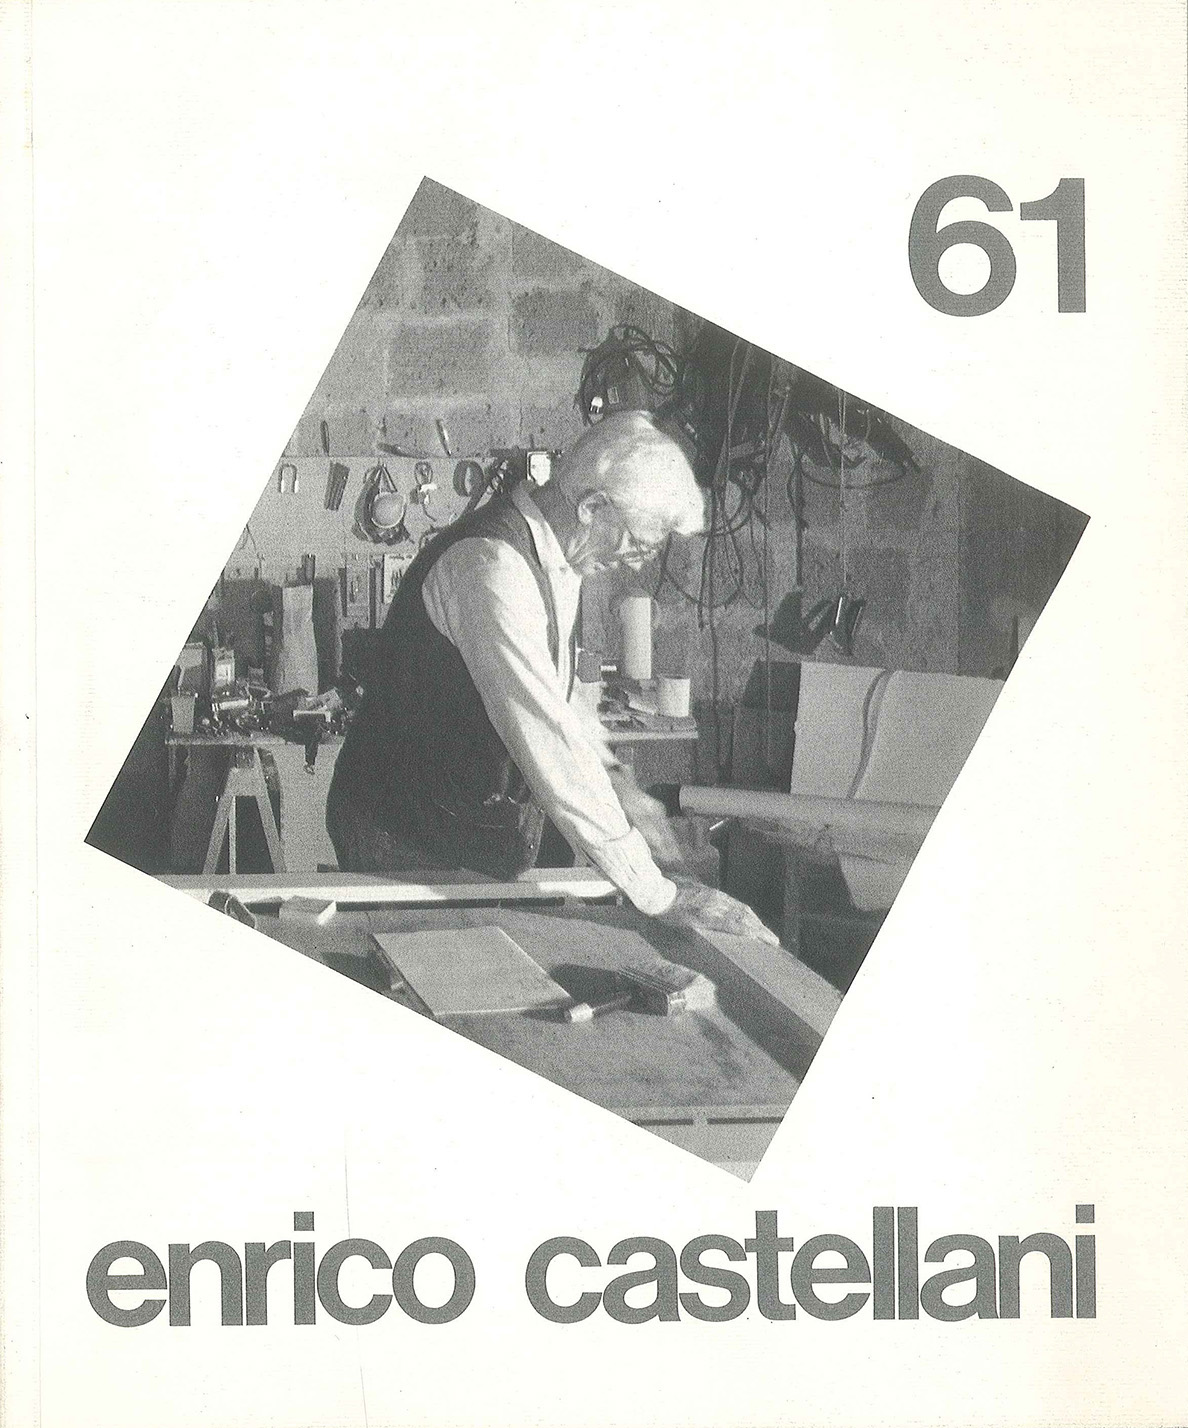 16 b - 1991